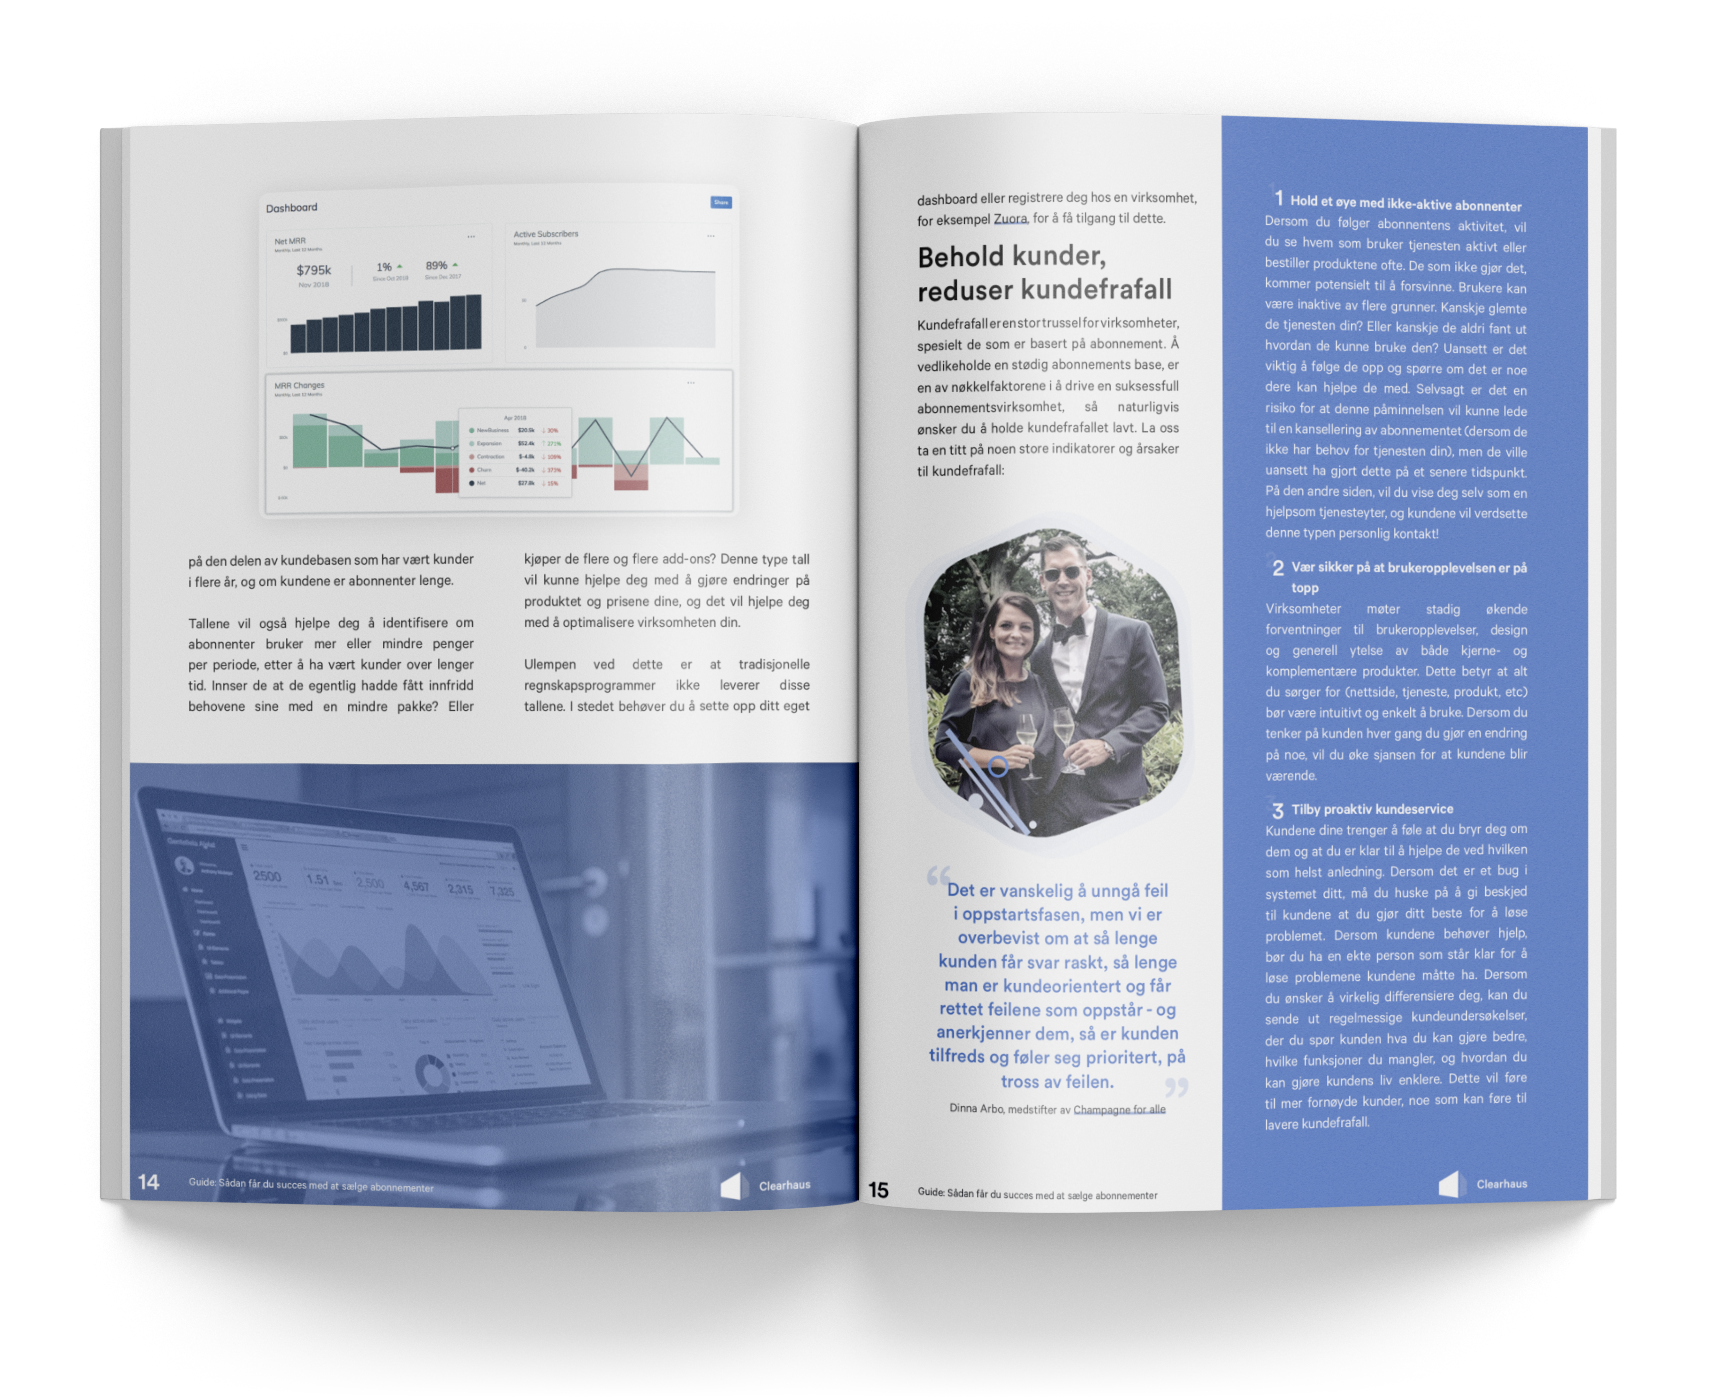 E-bok preview - pages 14 og 15